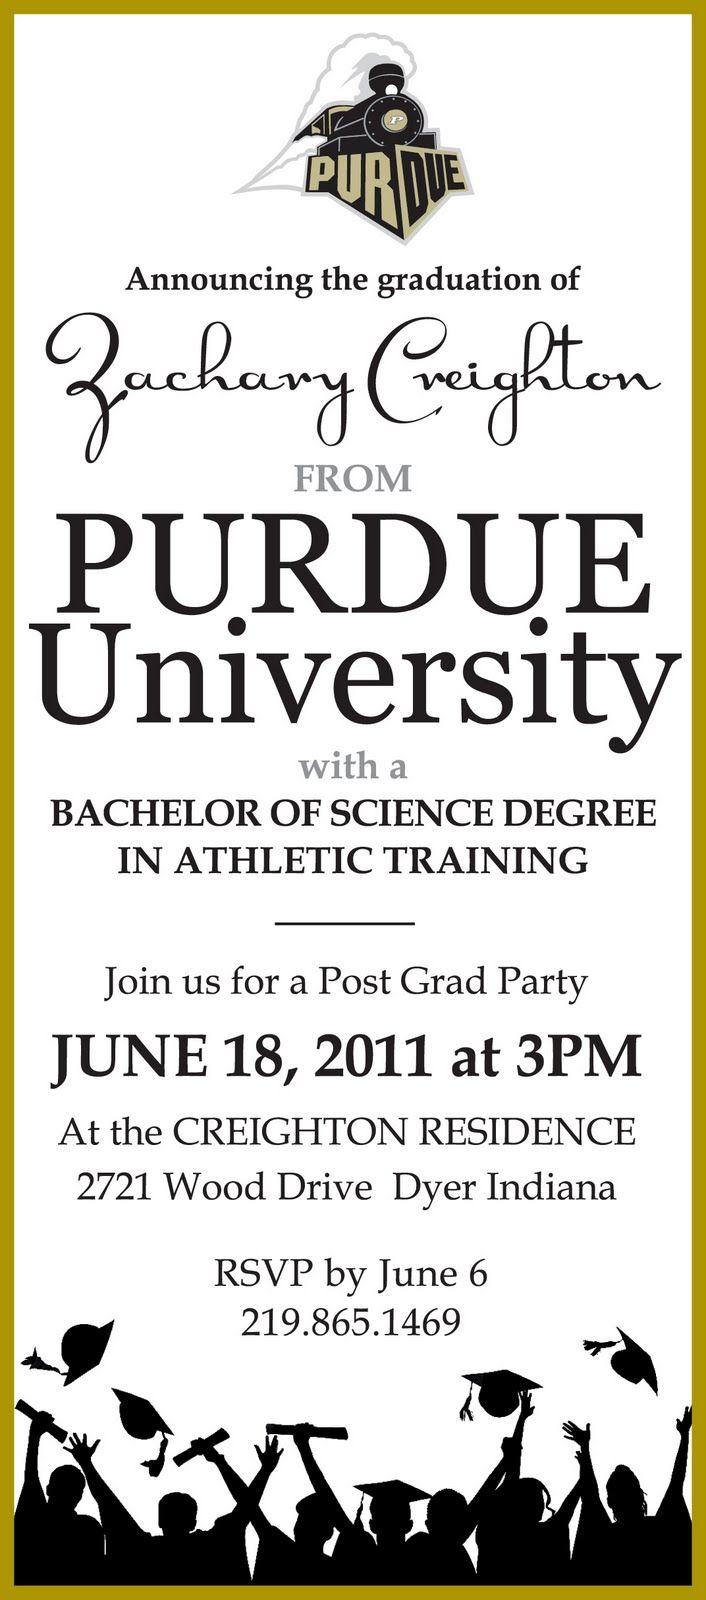 Color printing purdue - Purdue Logo Graduation Invitation Purdue University Graduation Party Invitation Along With A High School